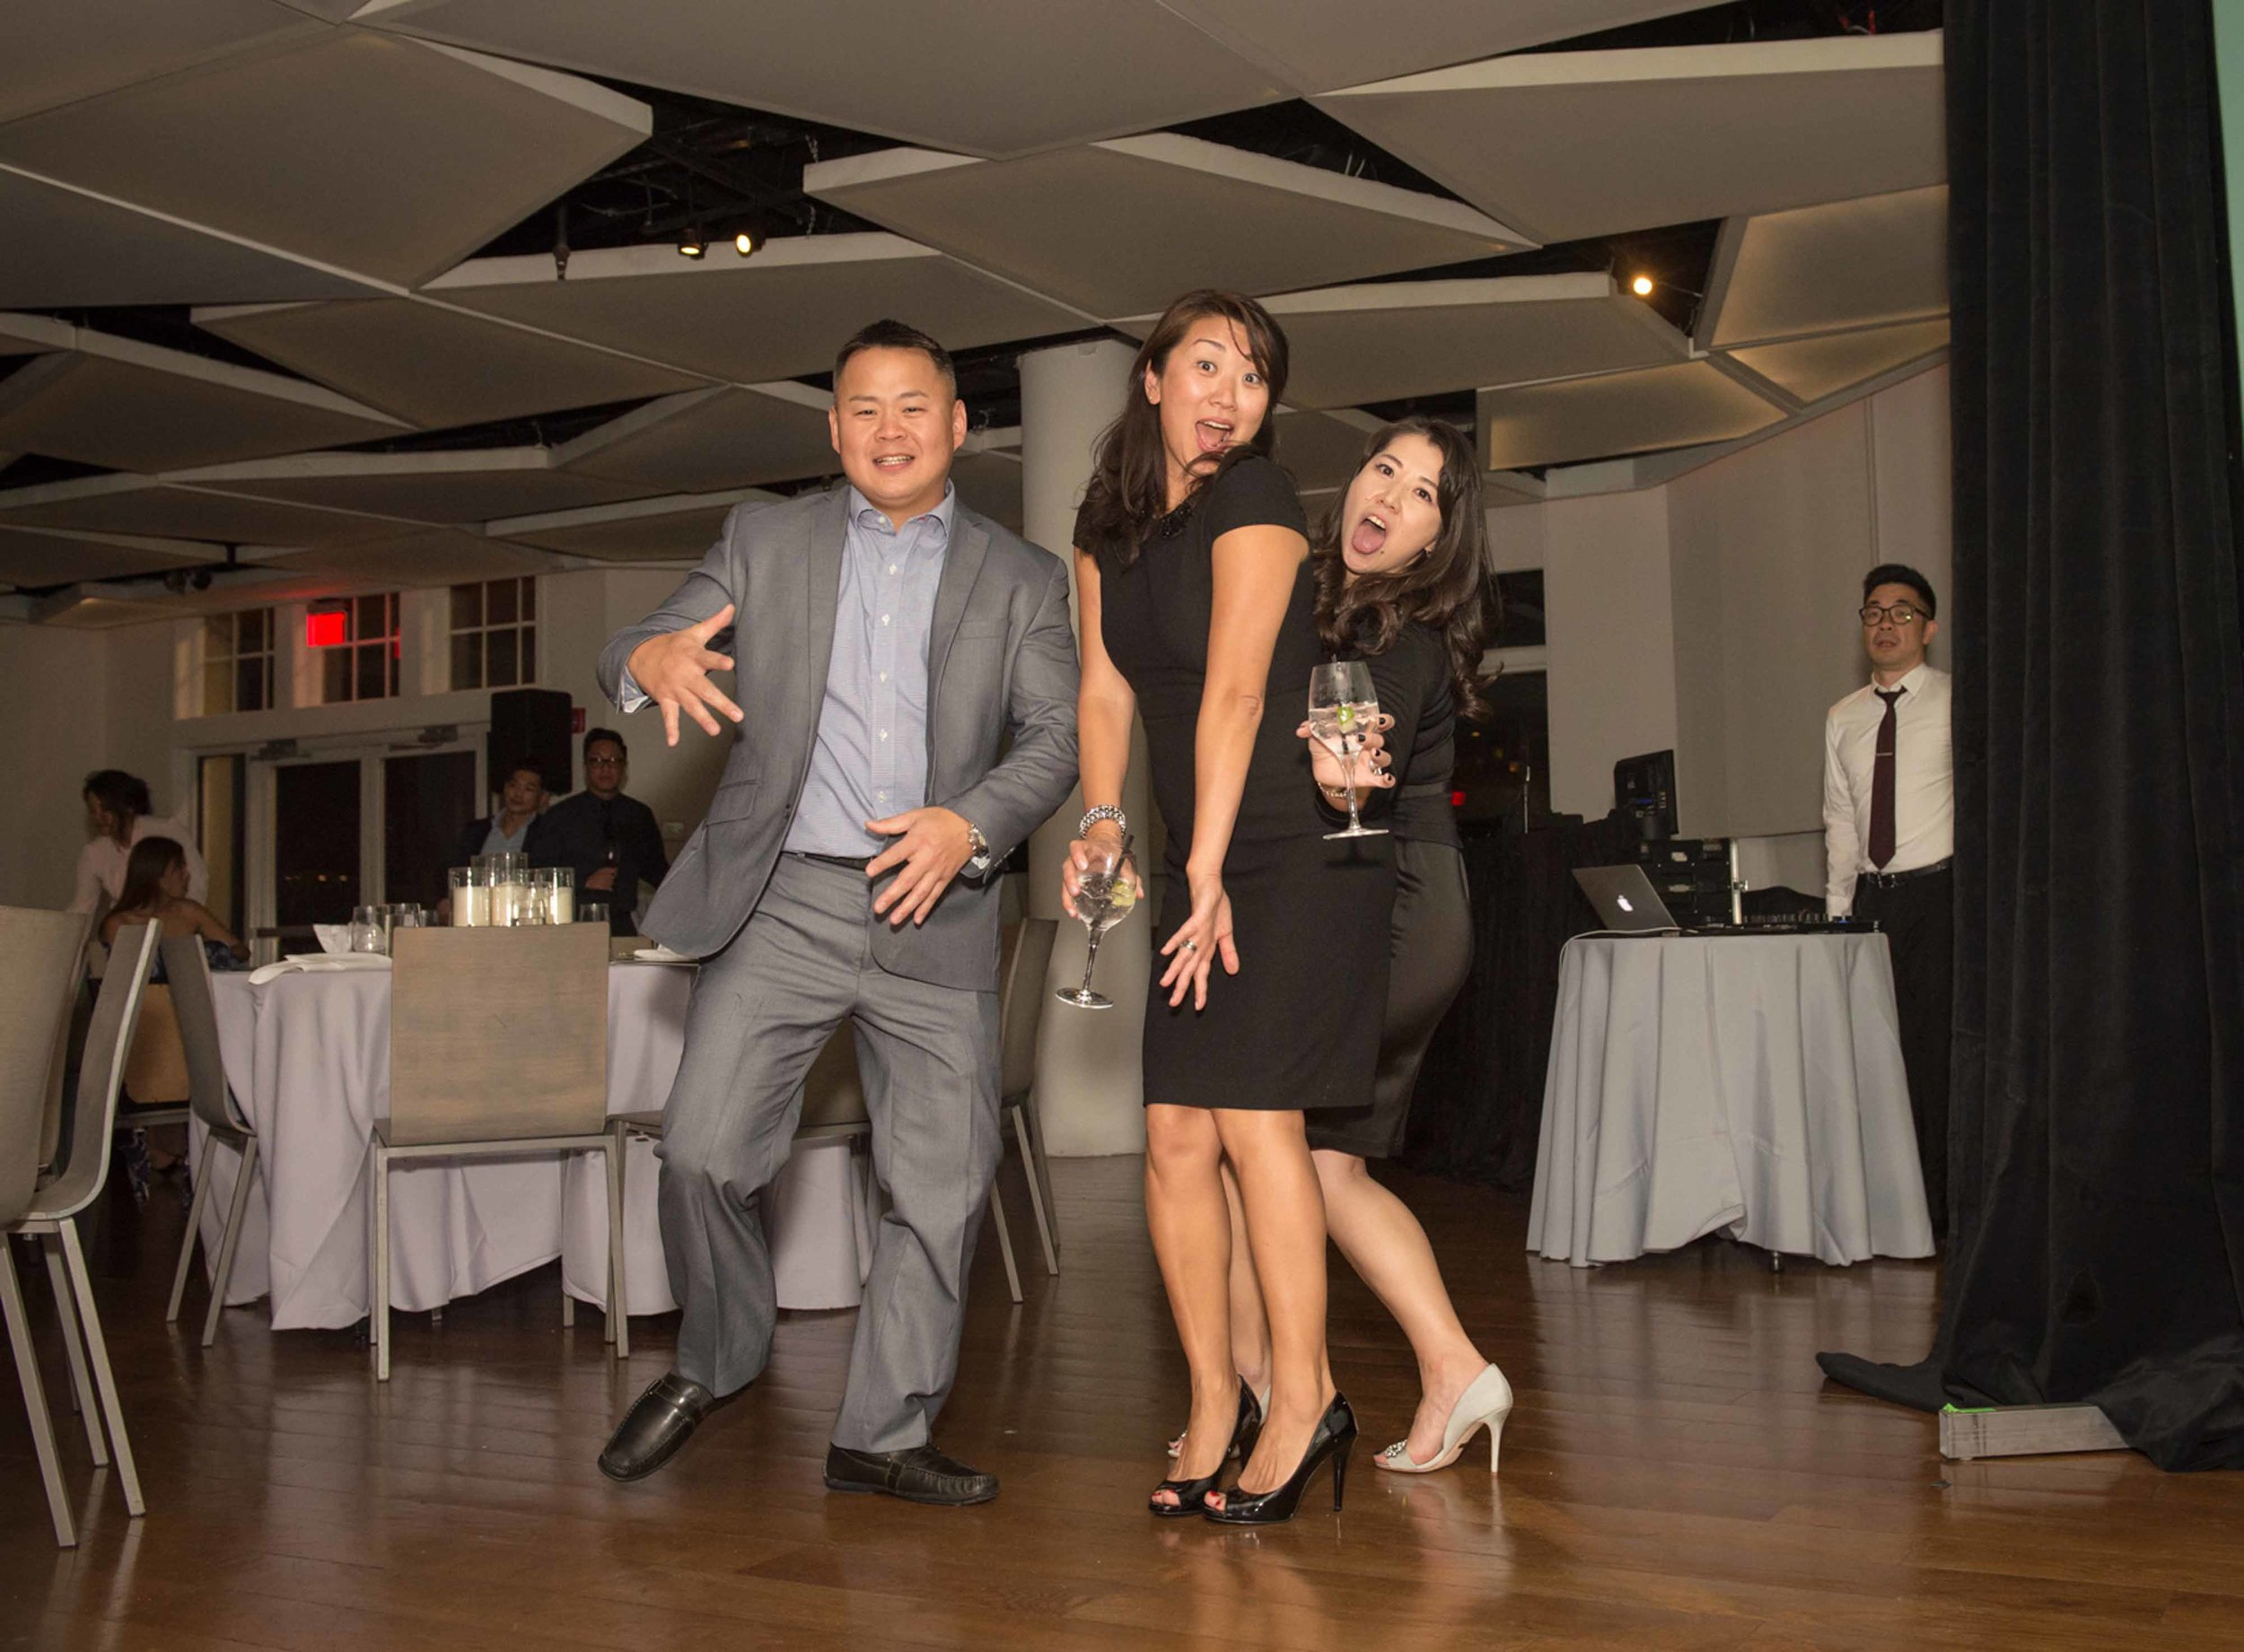 2017-10-21 Zimele USA 6th Annual Gala - Maritime Parc - Jersey City NJ_0340.jpg